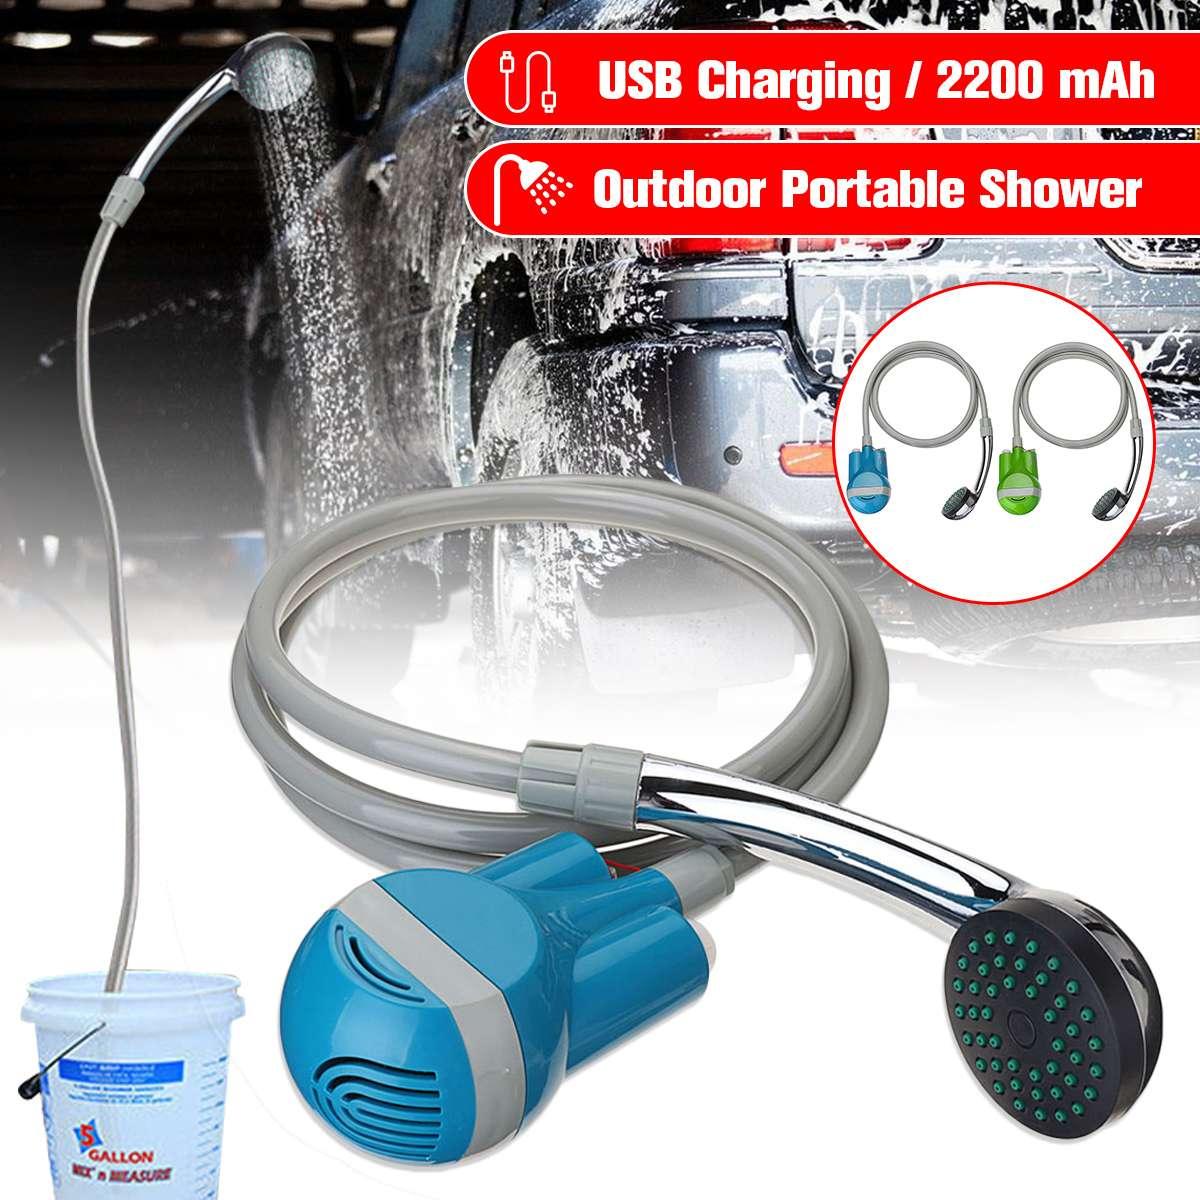 12V Car Washer Portable Camping Shower Wireless Car Shower DC 12V Pump Pressure Shower Outdoor Travel Caravan Van Pet Water Tank